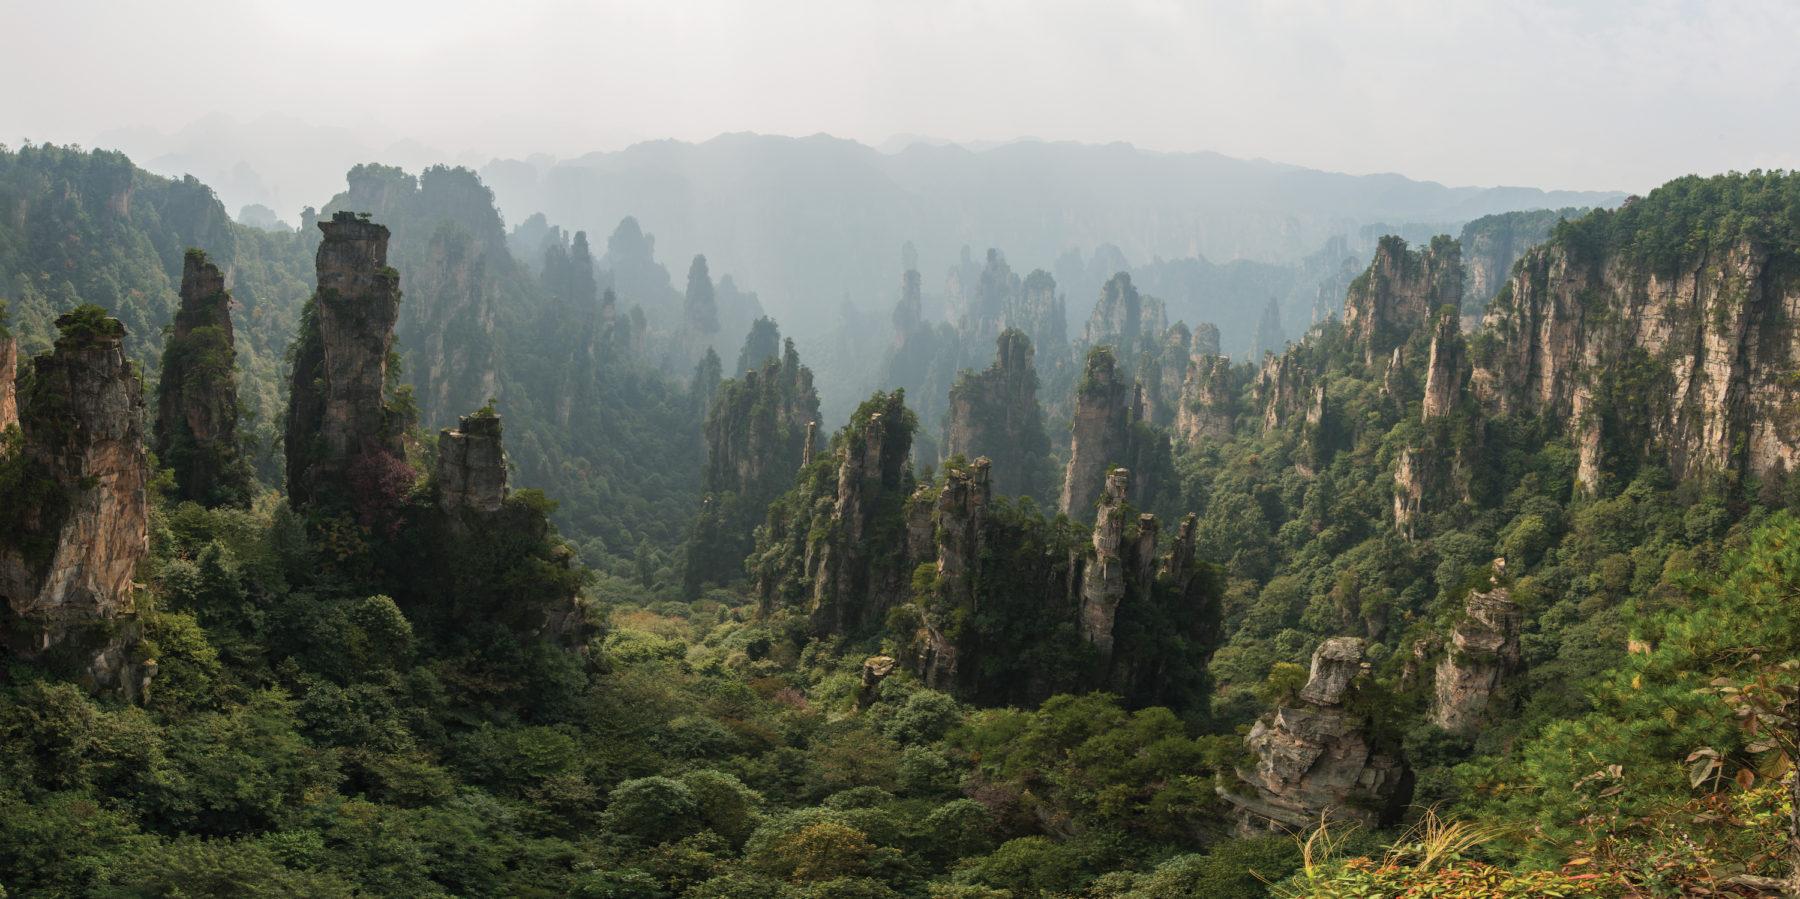 Zhangjiajie National Forest Park, China. Photo: Chensiyuan.